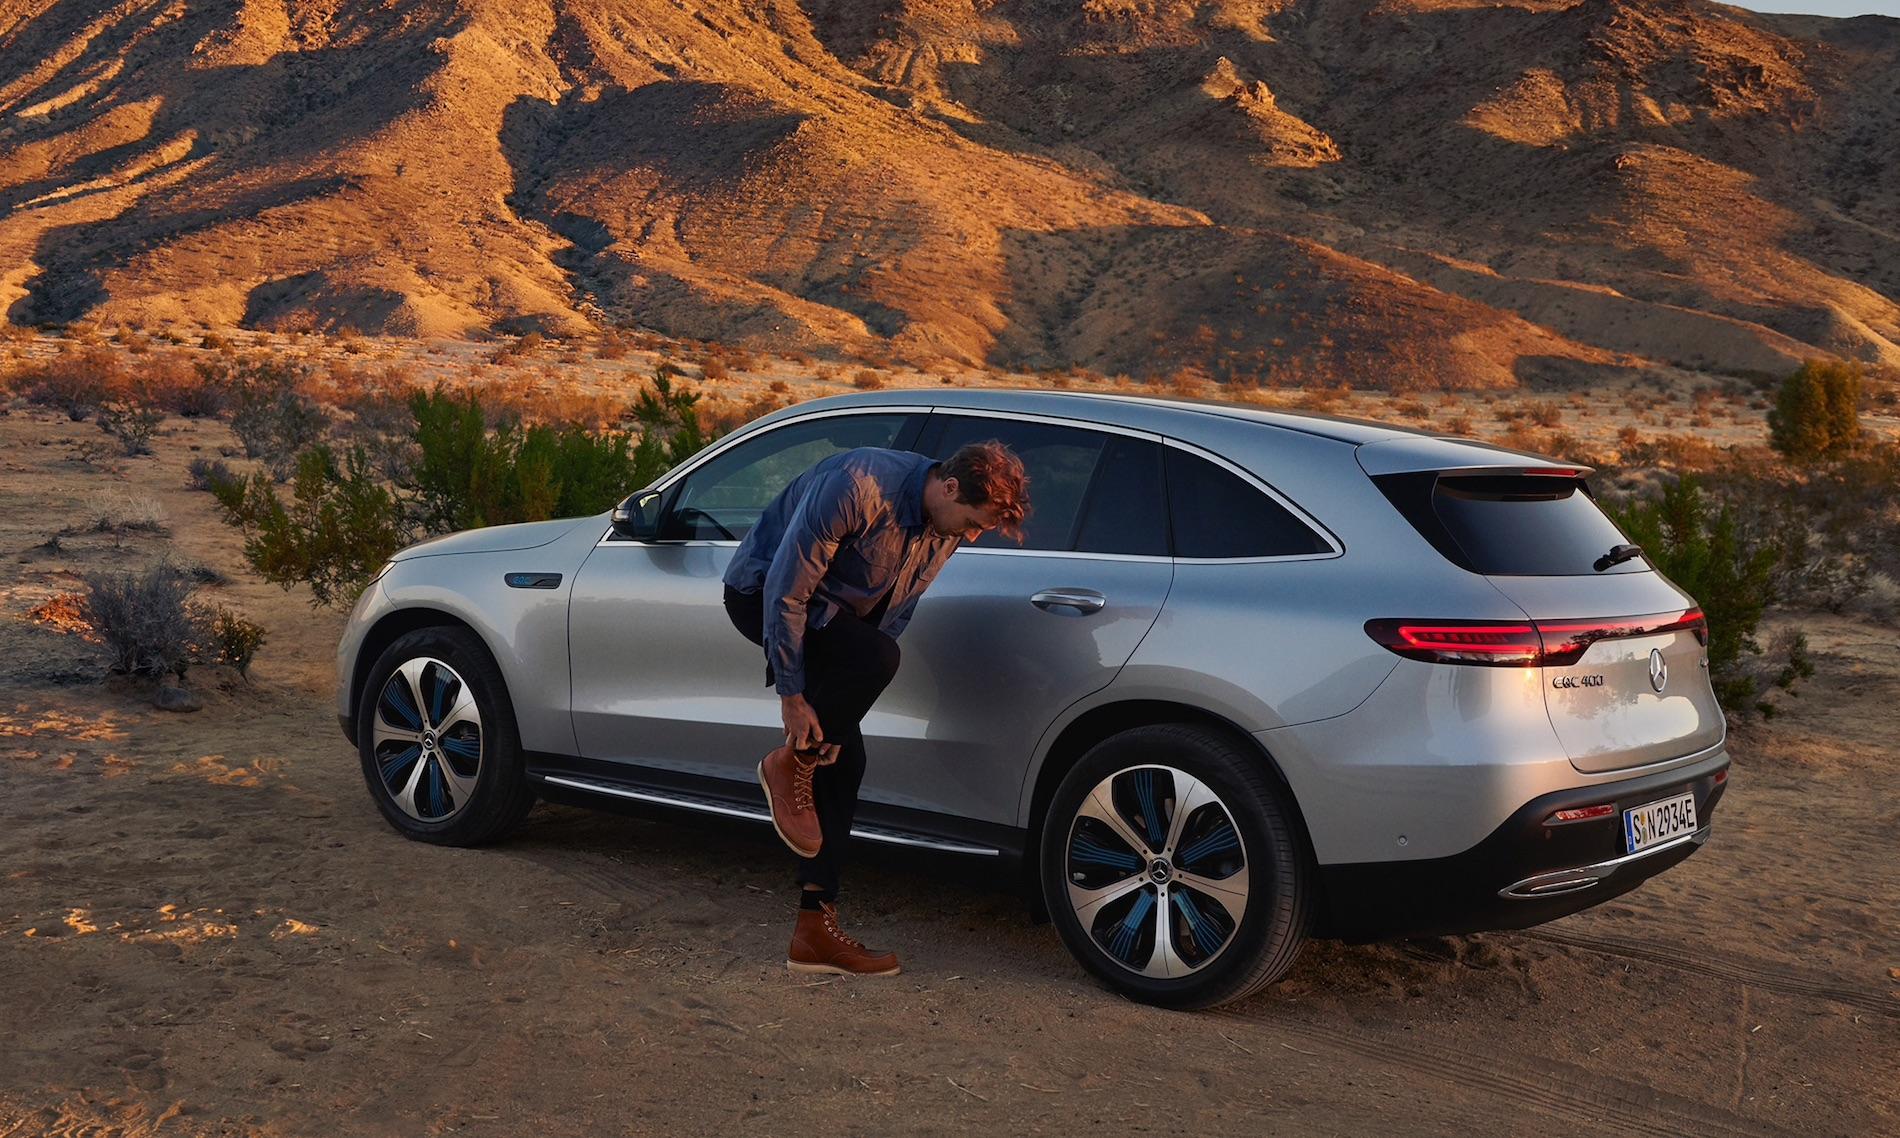 Mercedes Eqc Desert